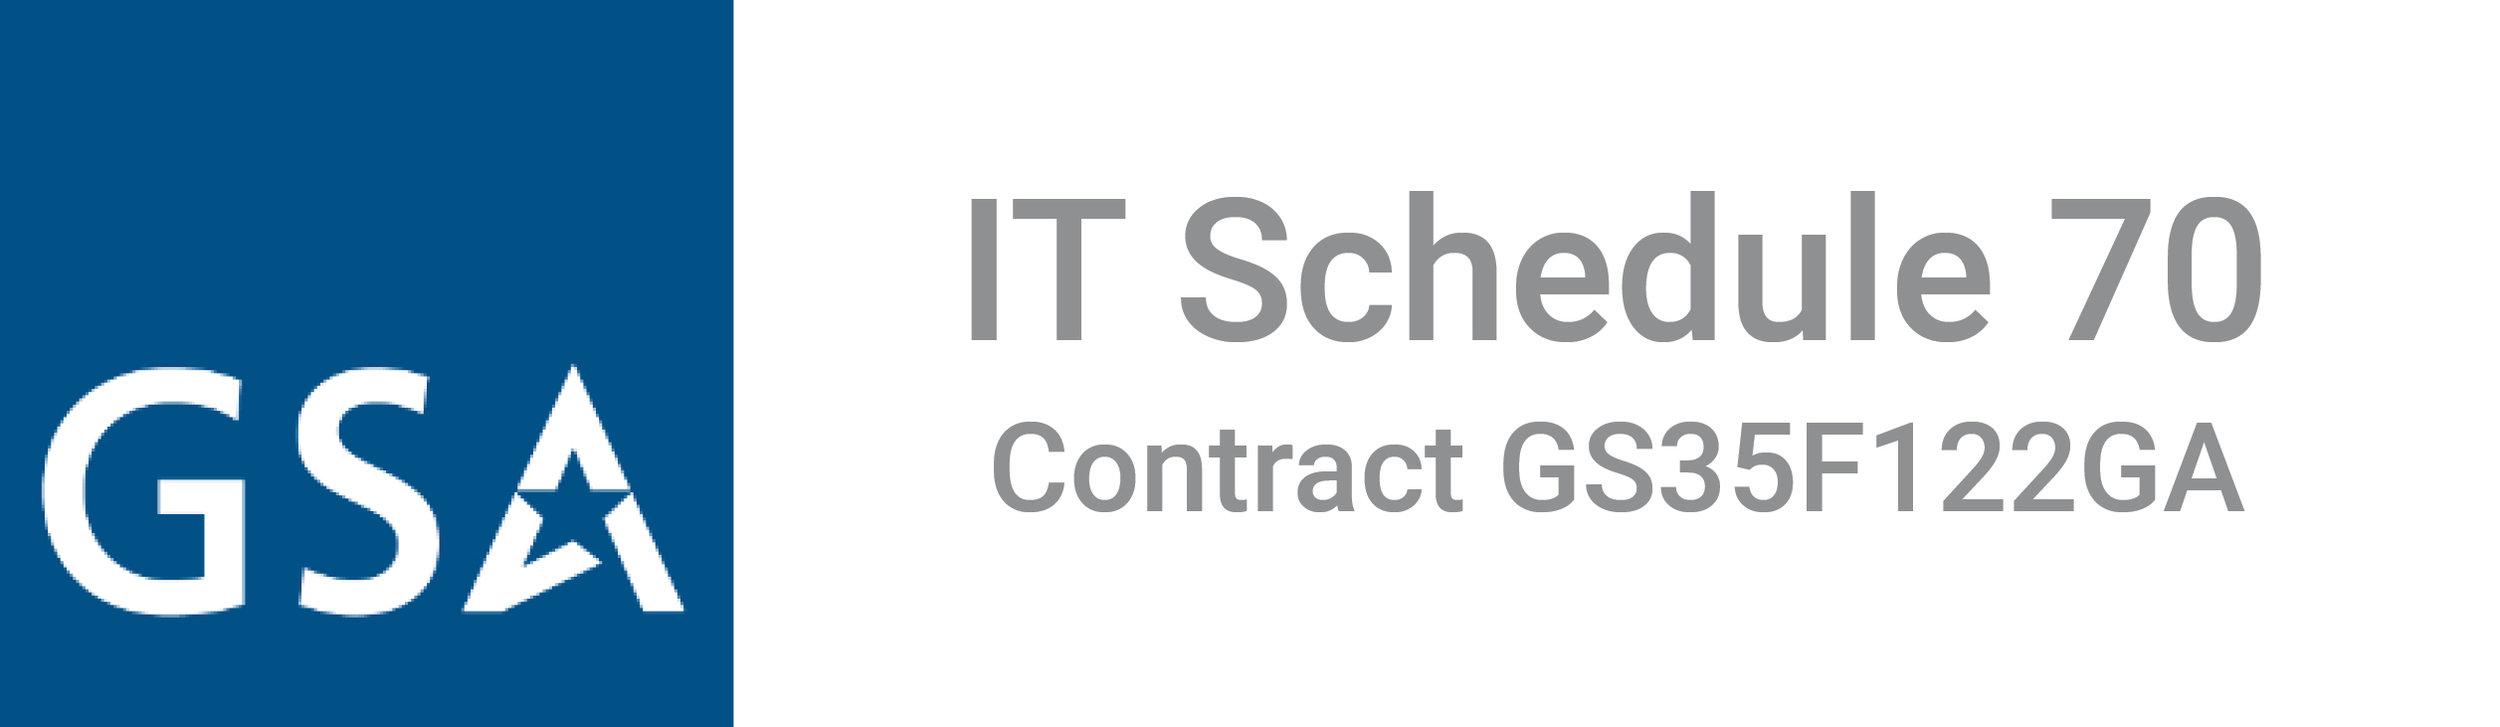 GSA contract.jpg